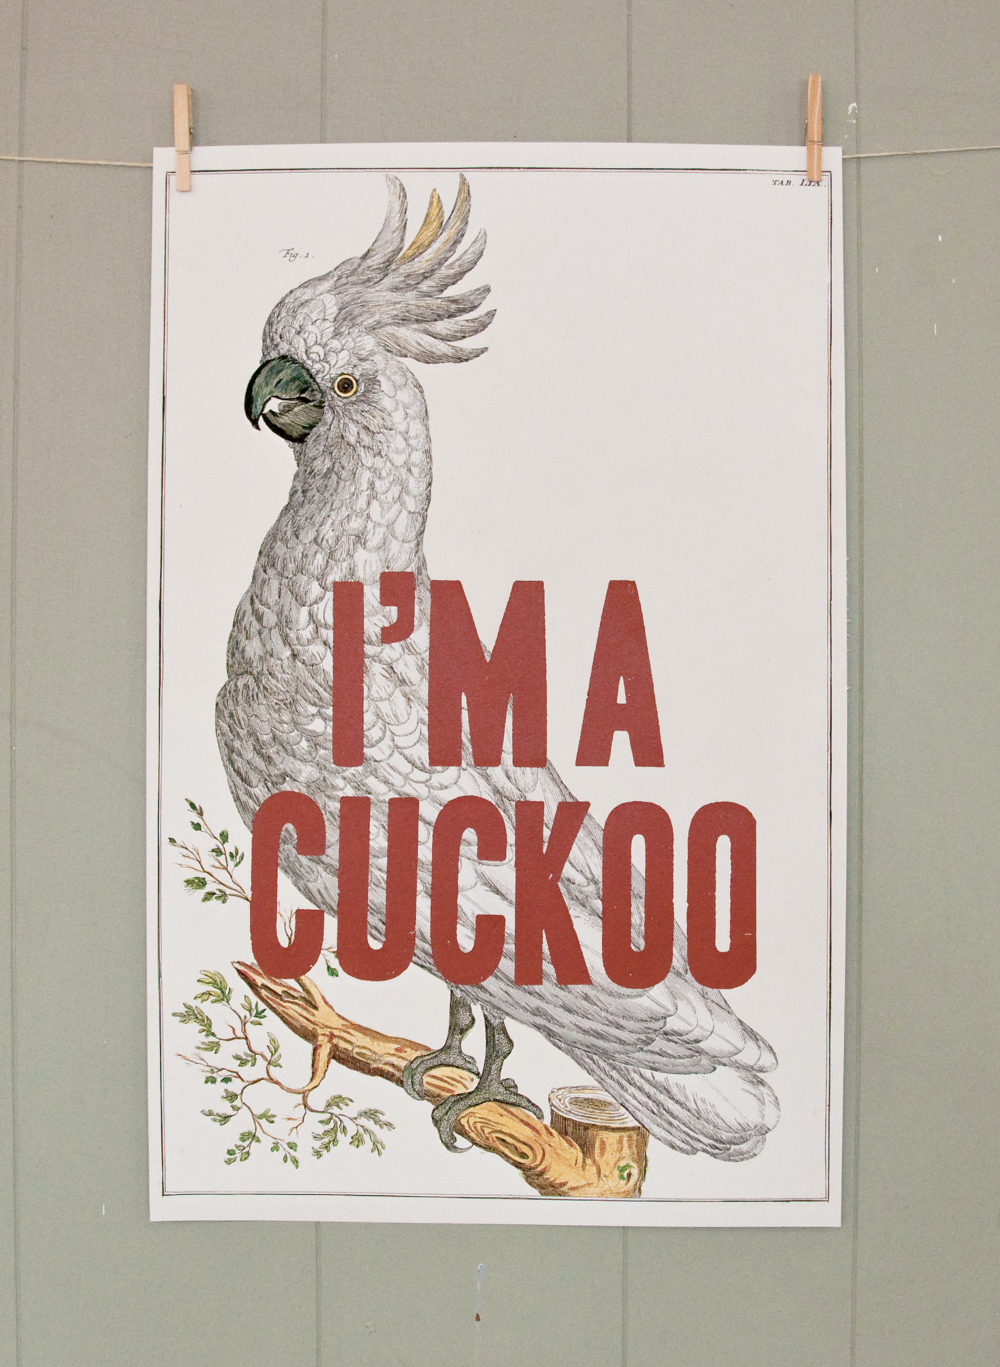 I'm a cuckoo.